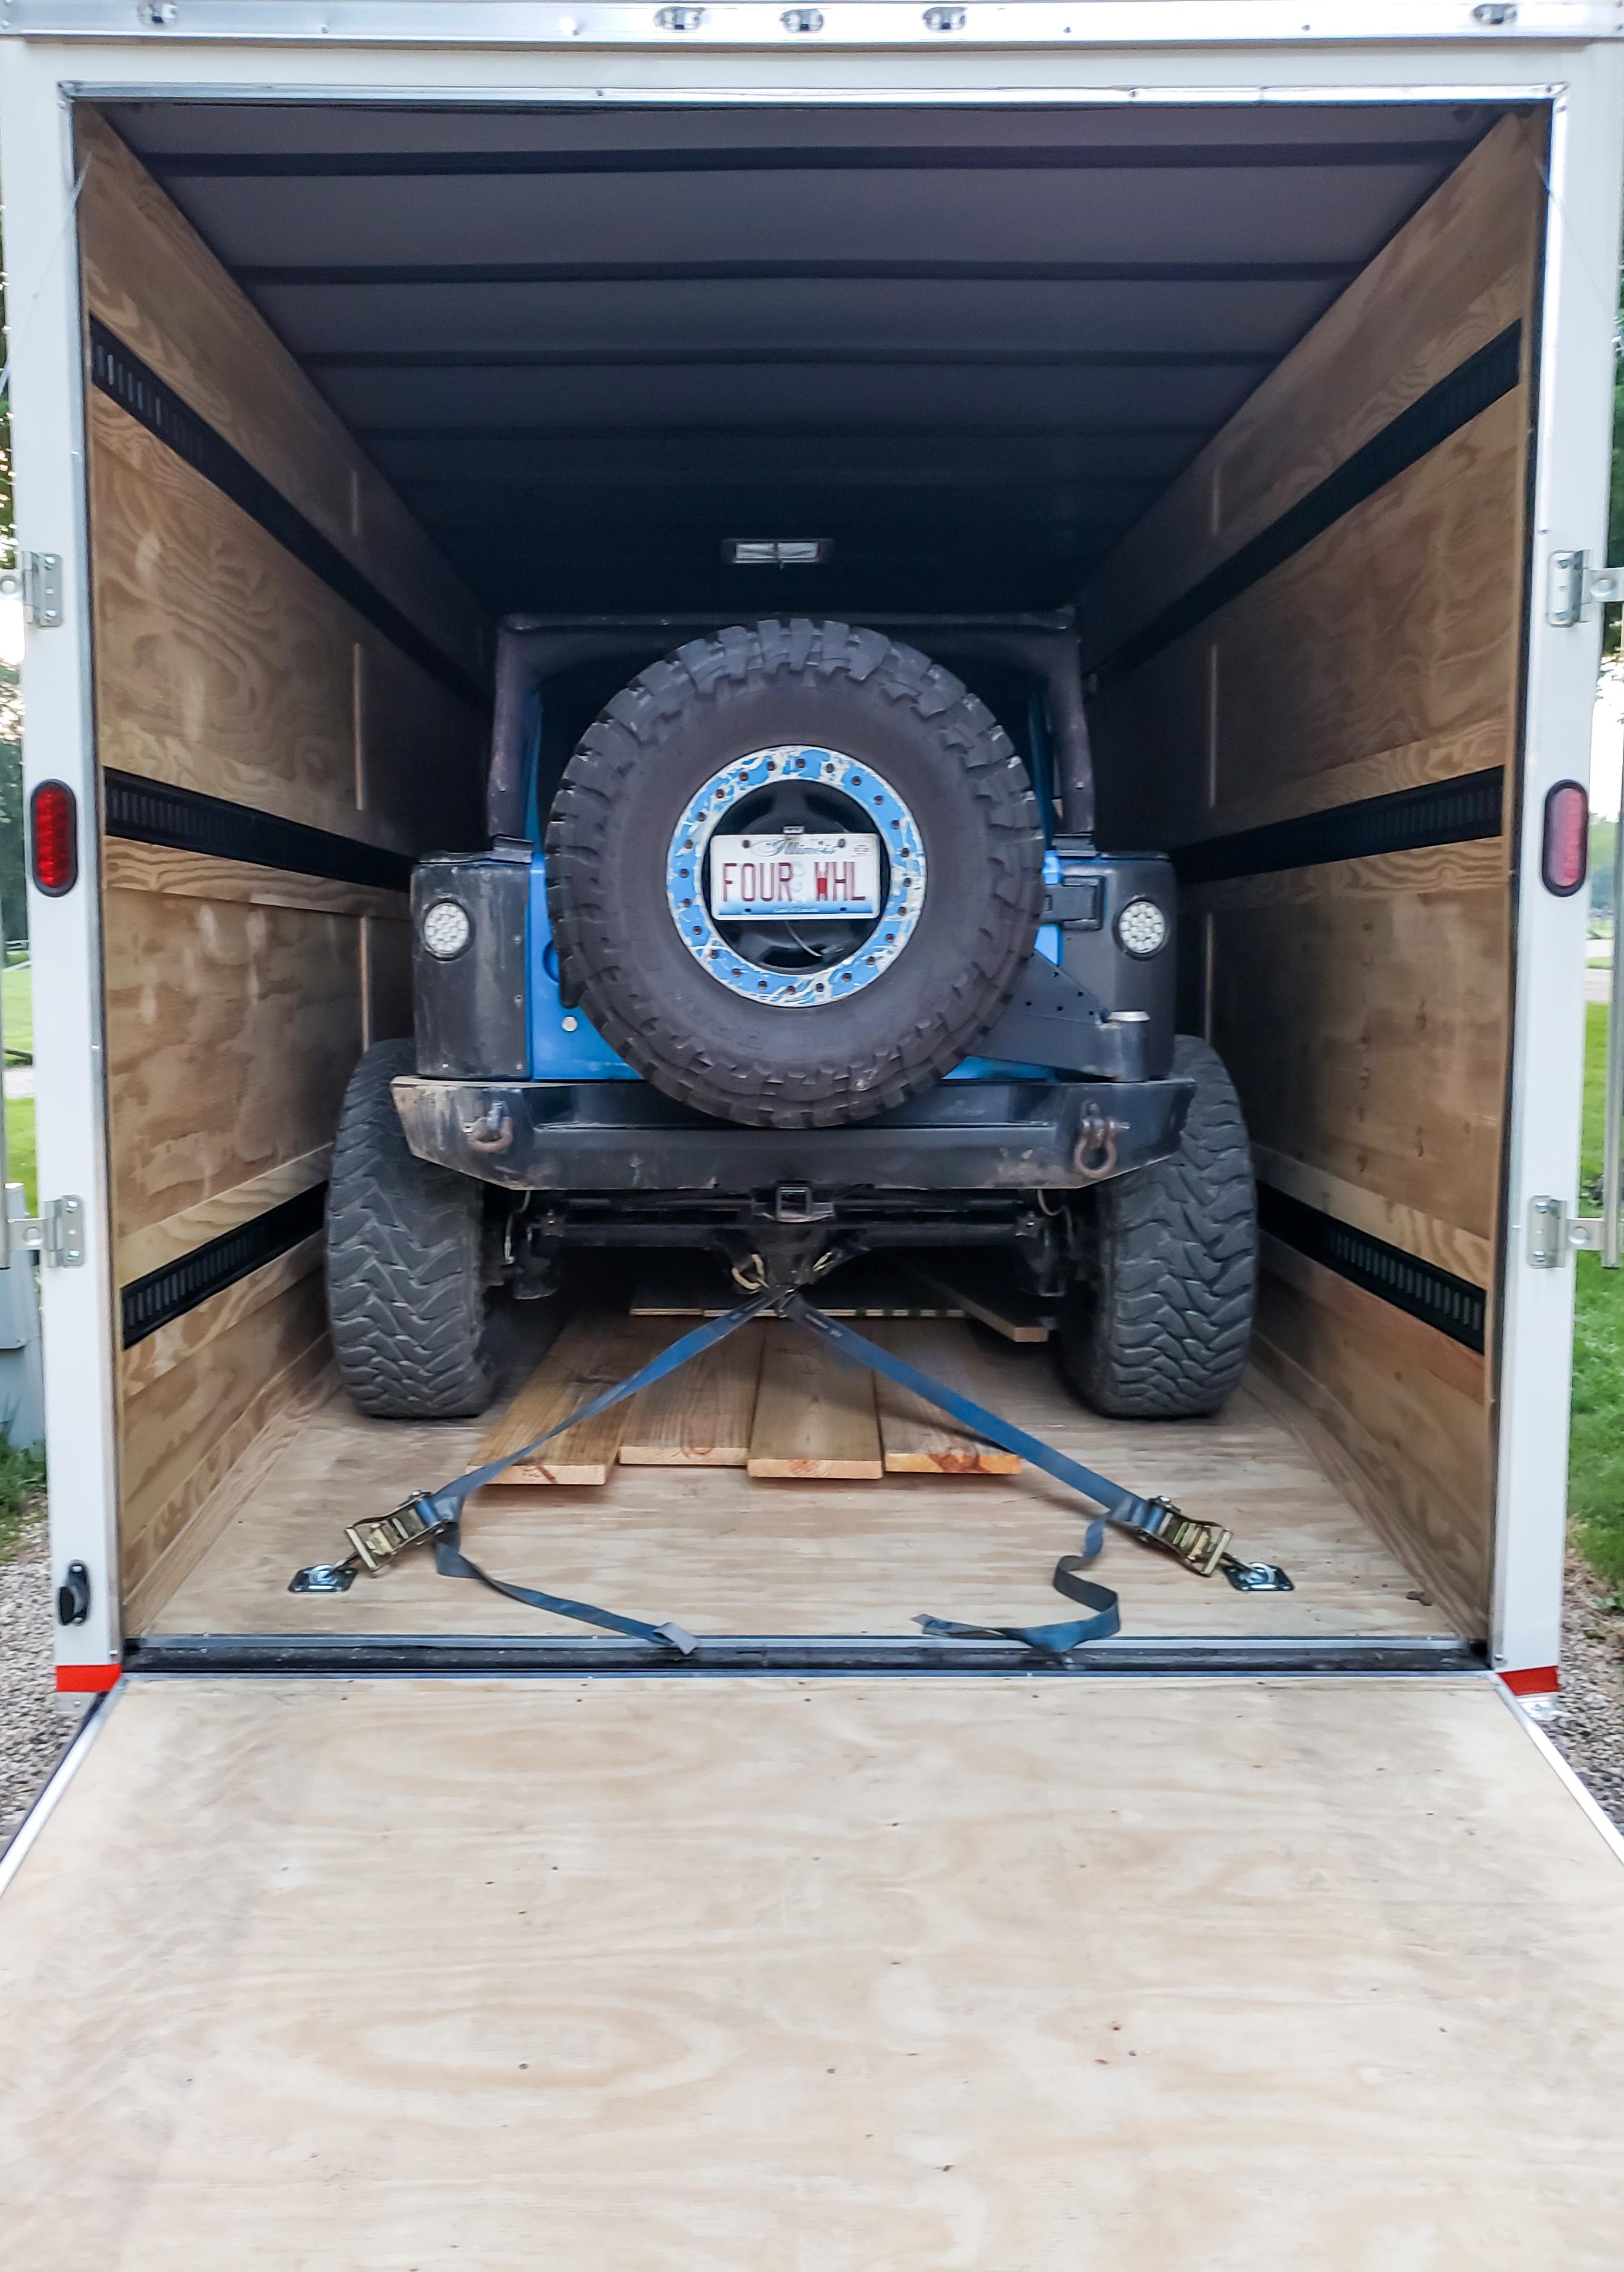 Jeep inside new upgrade trailer